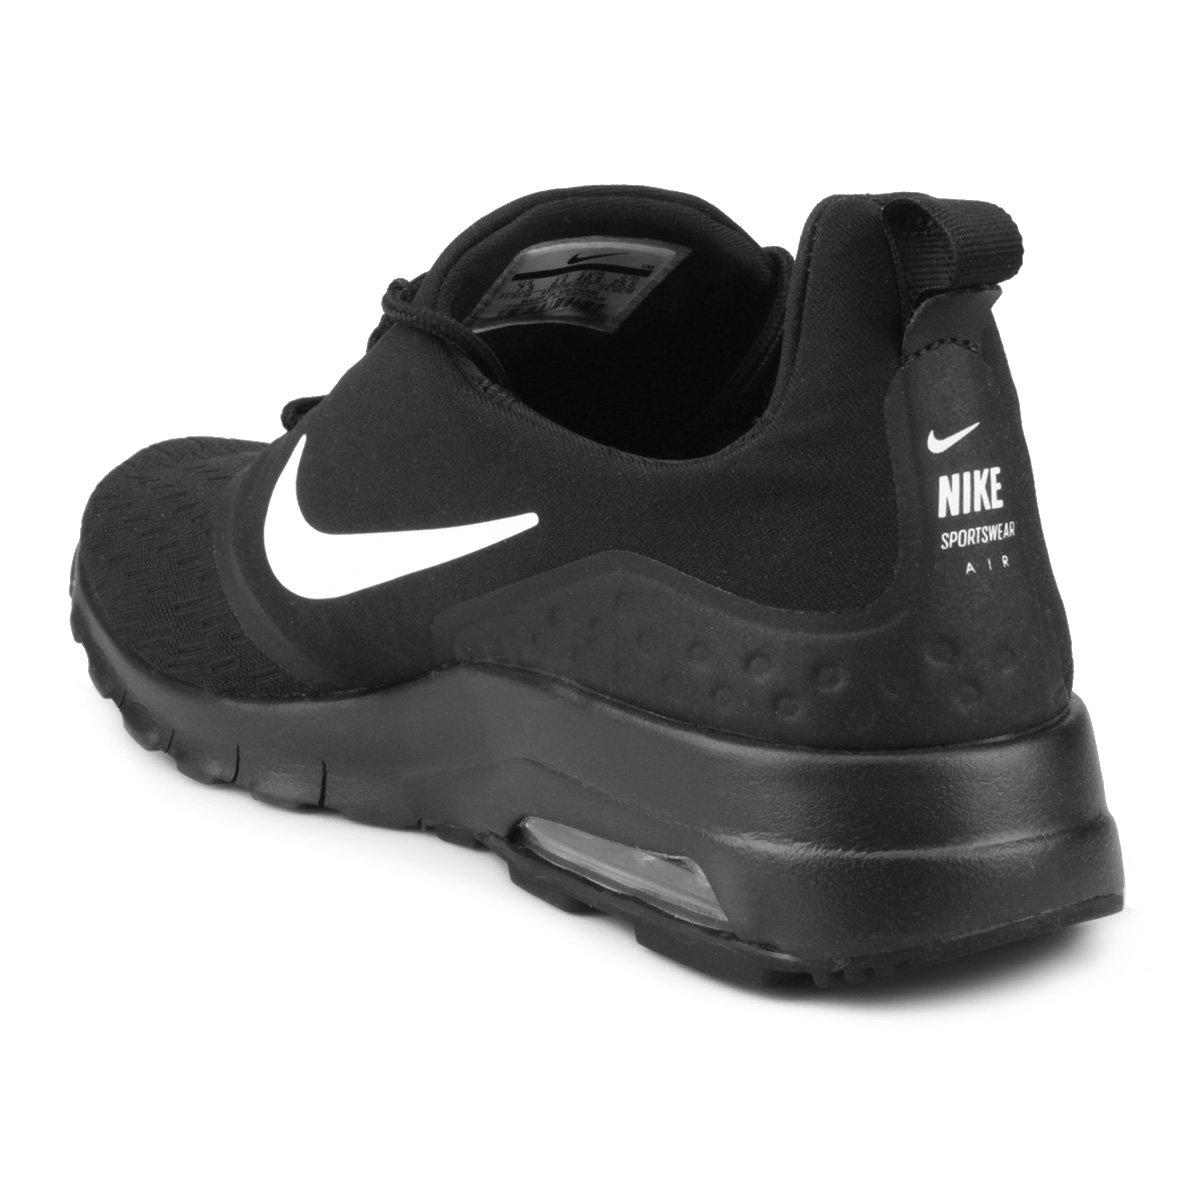 56ad08f3a1 Tênis Nike Air Max Motion Racer 2 - Compre Agora